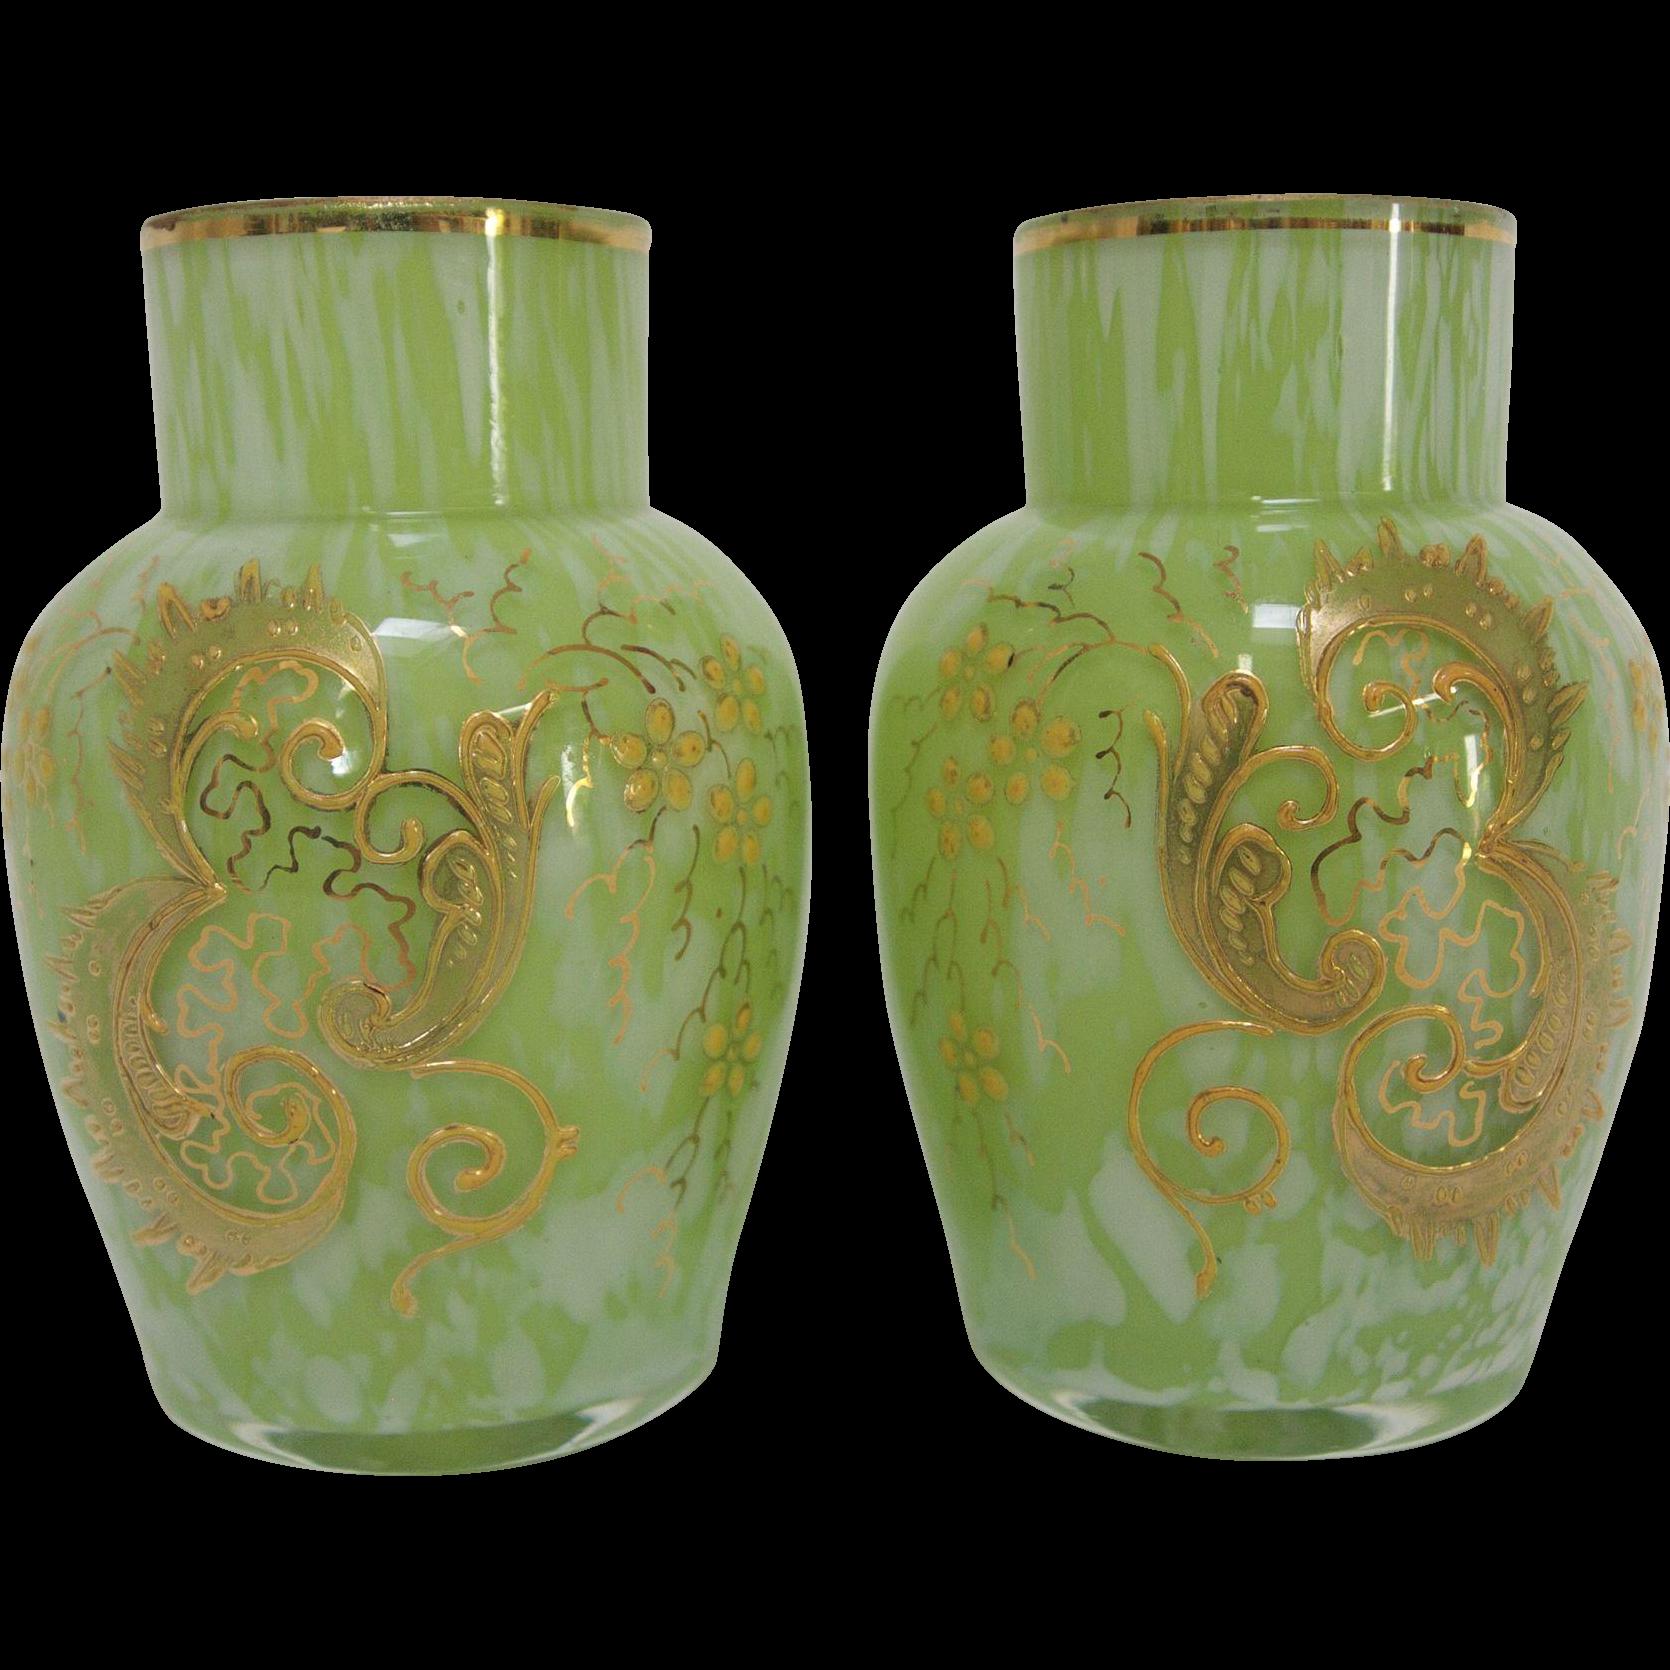 19th century harrach springtime art glass vases from rare 19th century harrach springtime art glass vases from reviewsmspy